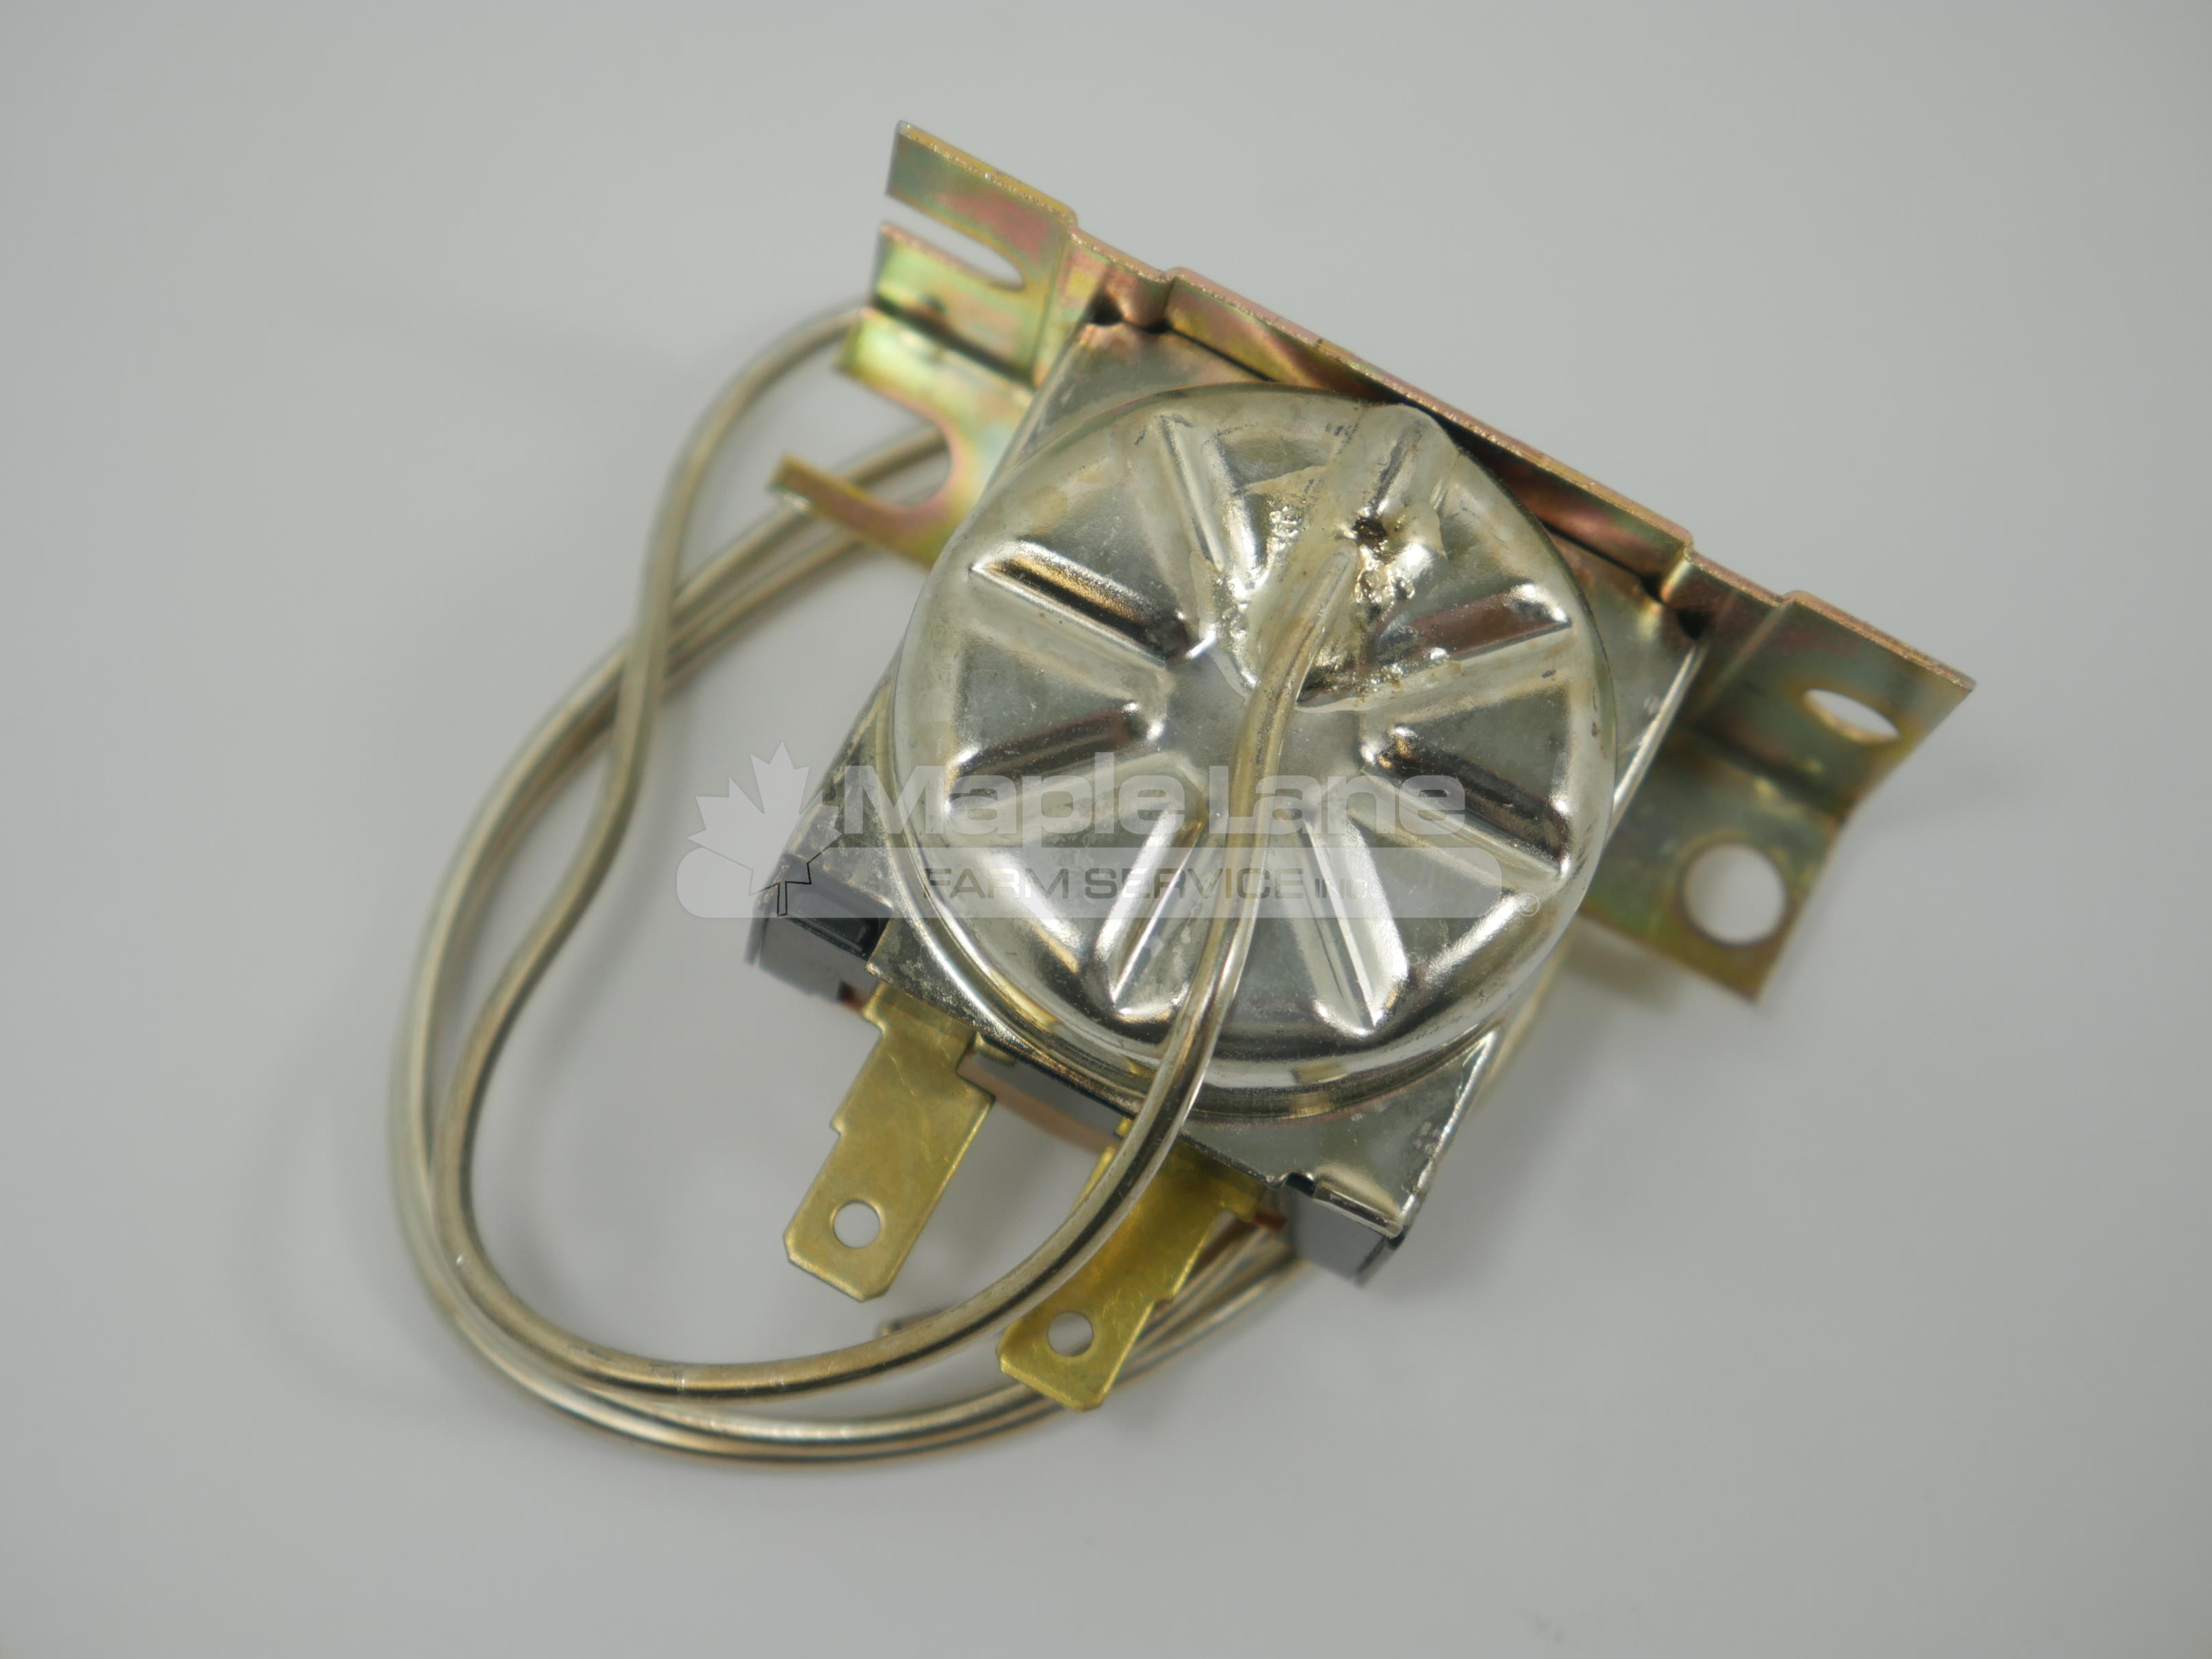 J603234 Thermostat